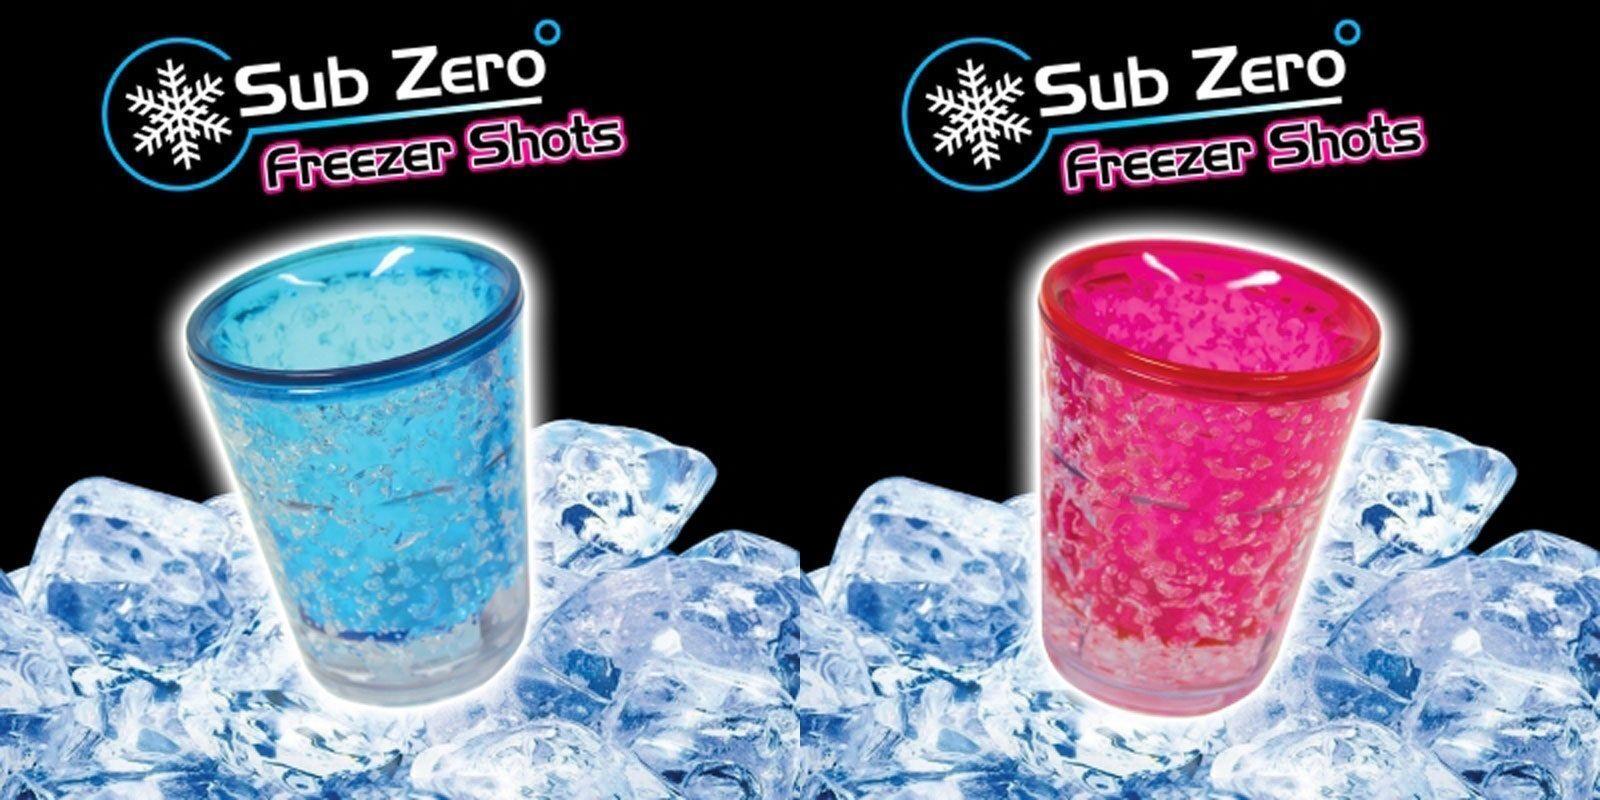 4 x Sub Zero Pink//Blue Freezer Ice Shot Glass Barware Party Stocking Filler Gift